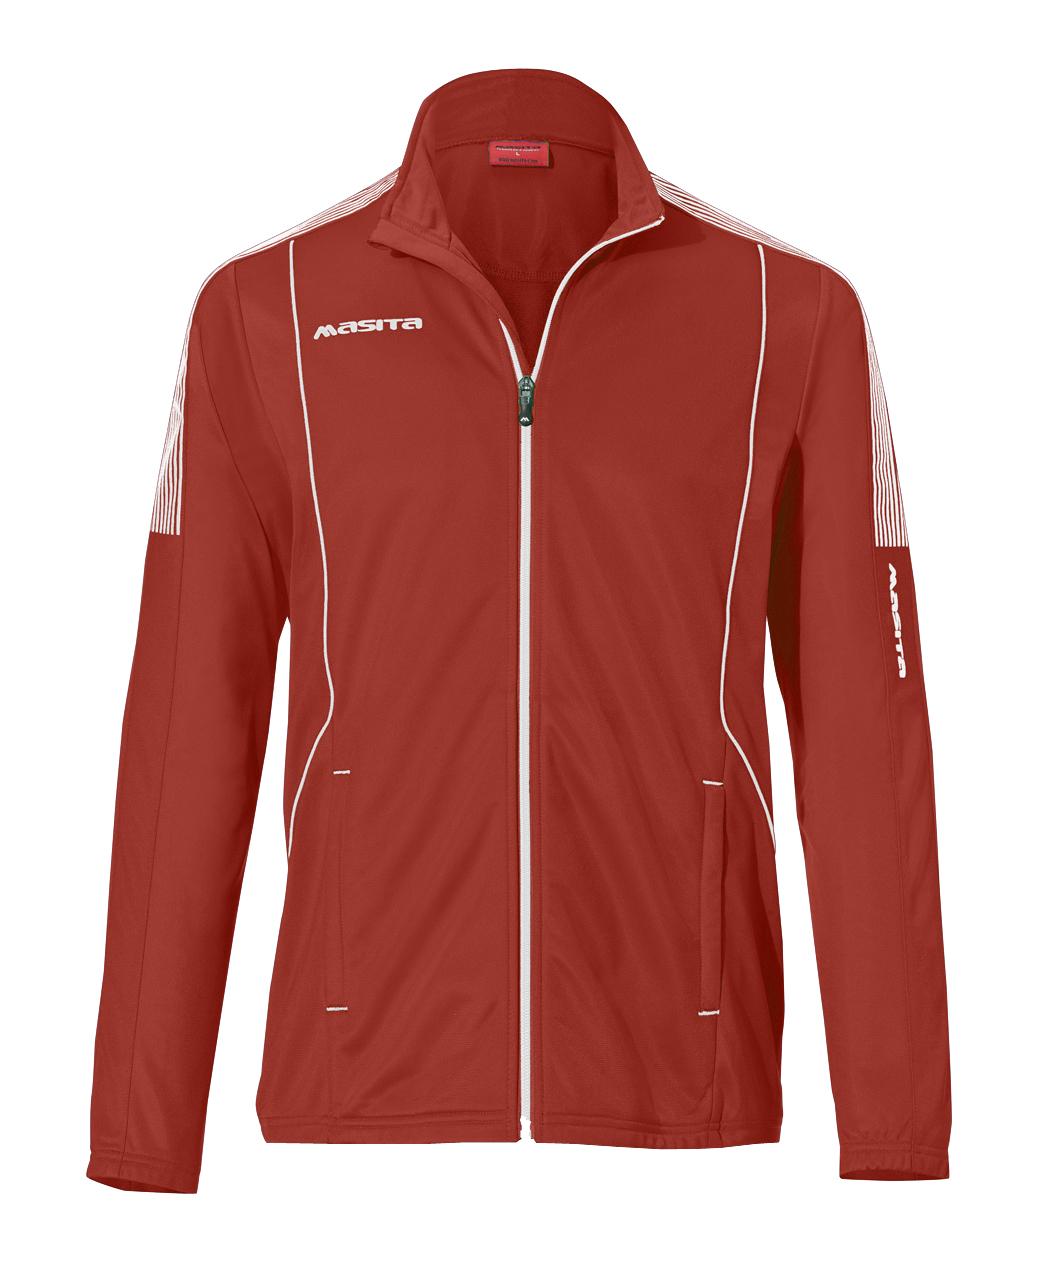 Presentation Jacket Barca  Red / White